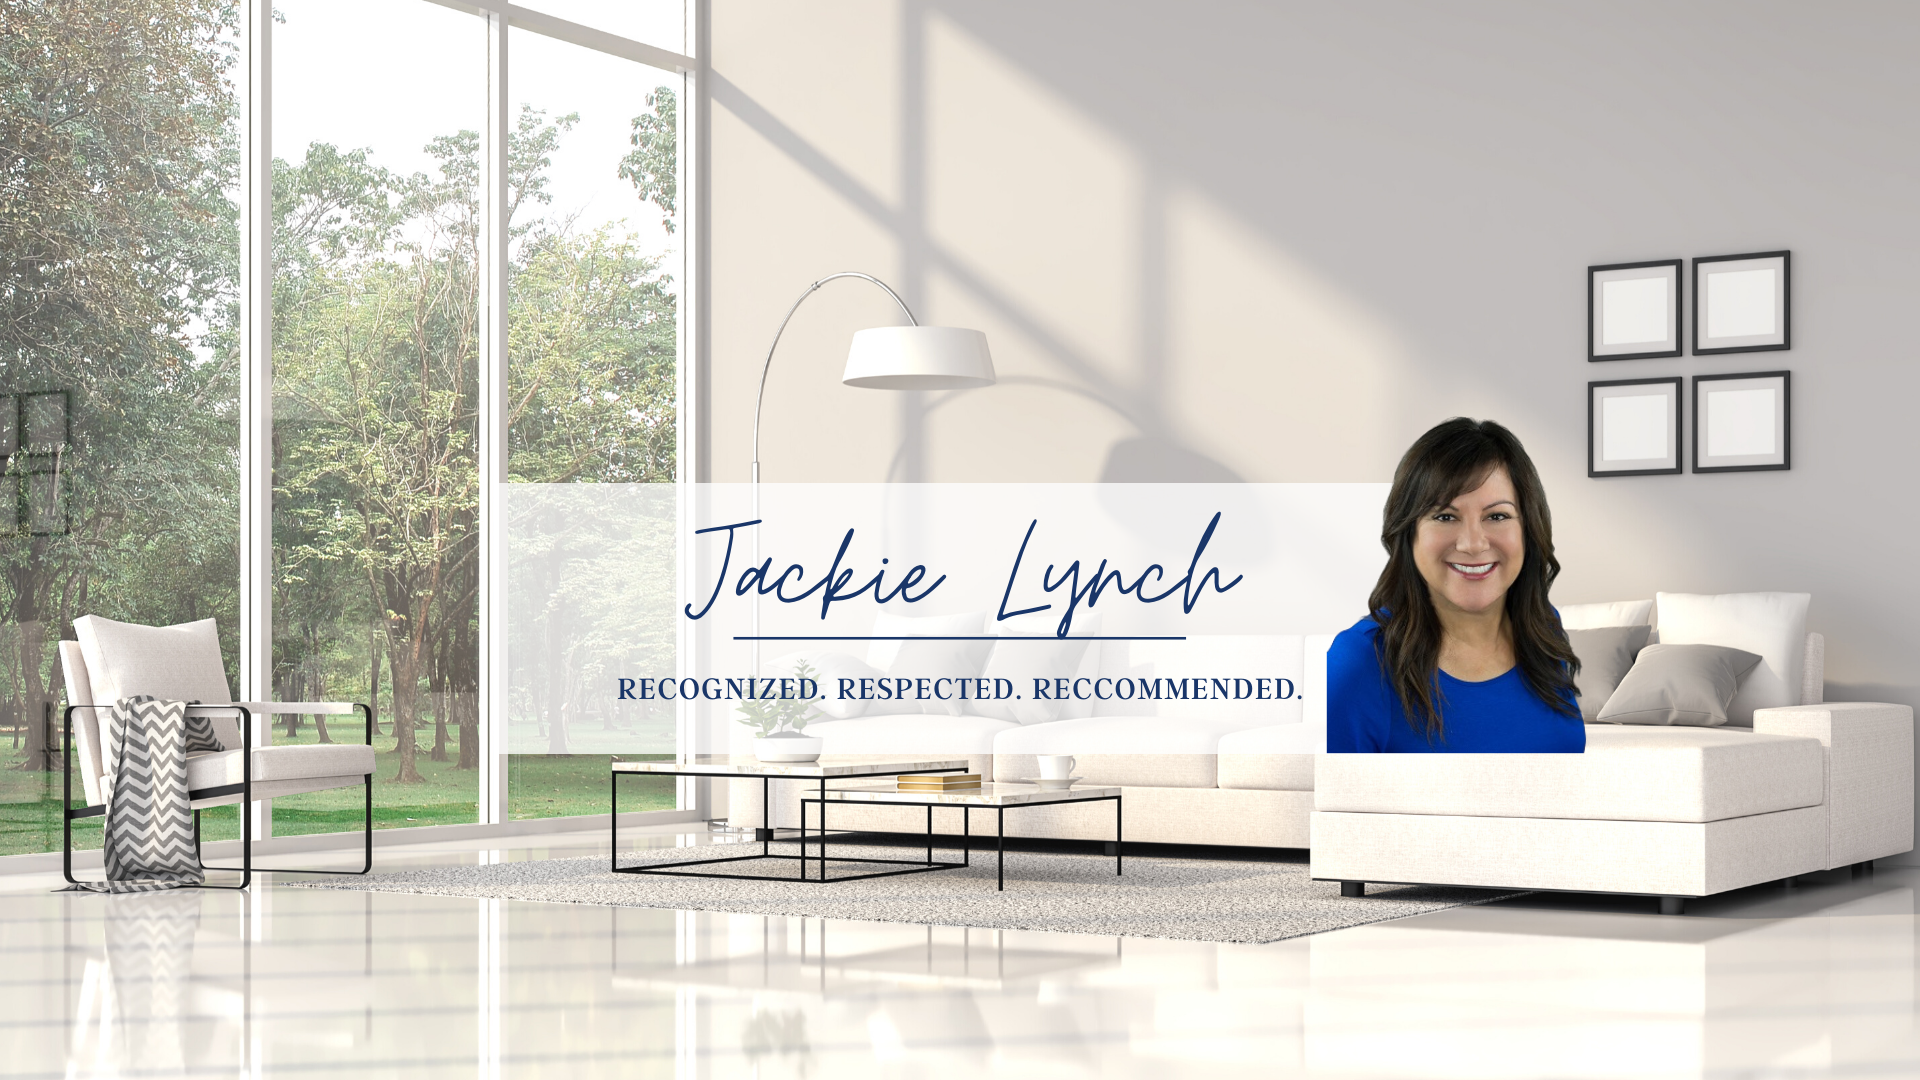 Jackie Lynch REMAX